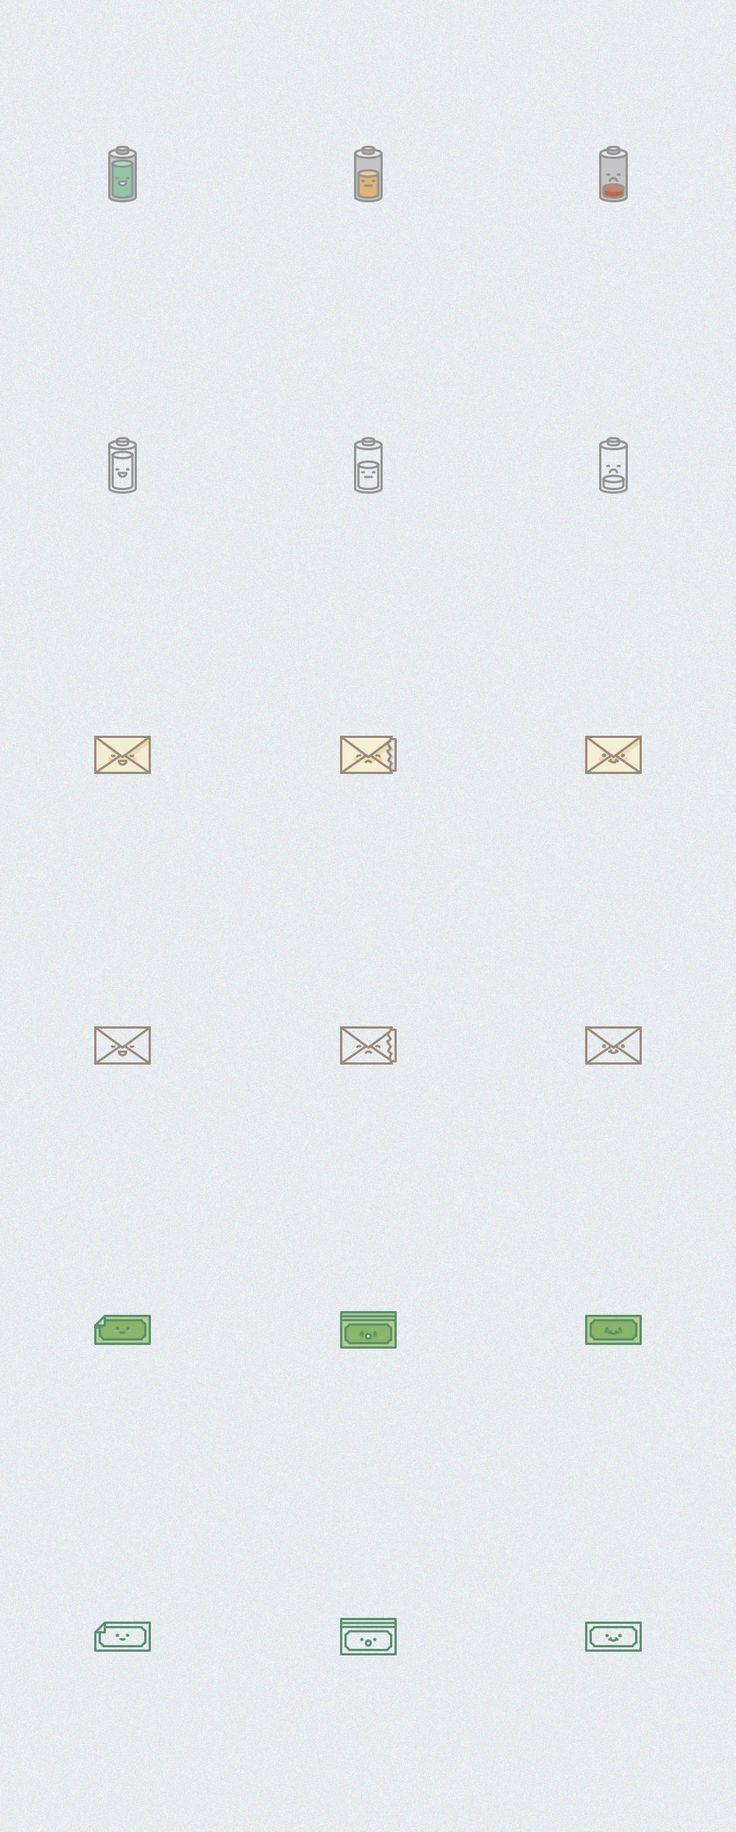 set of emotion icons vol.2 - oxygenna